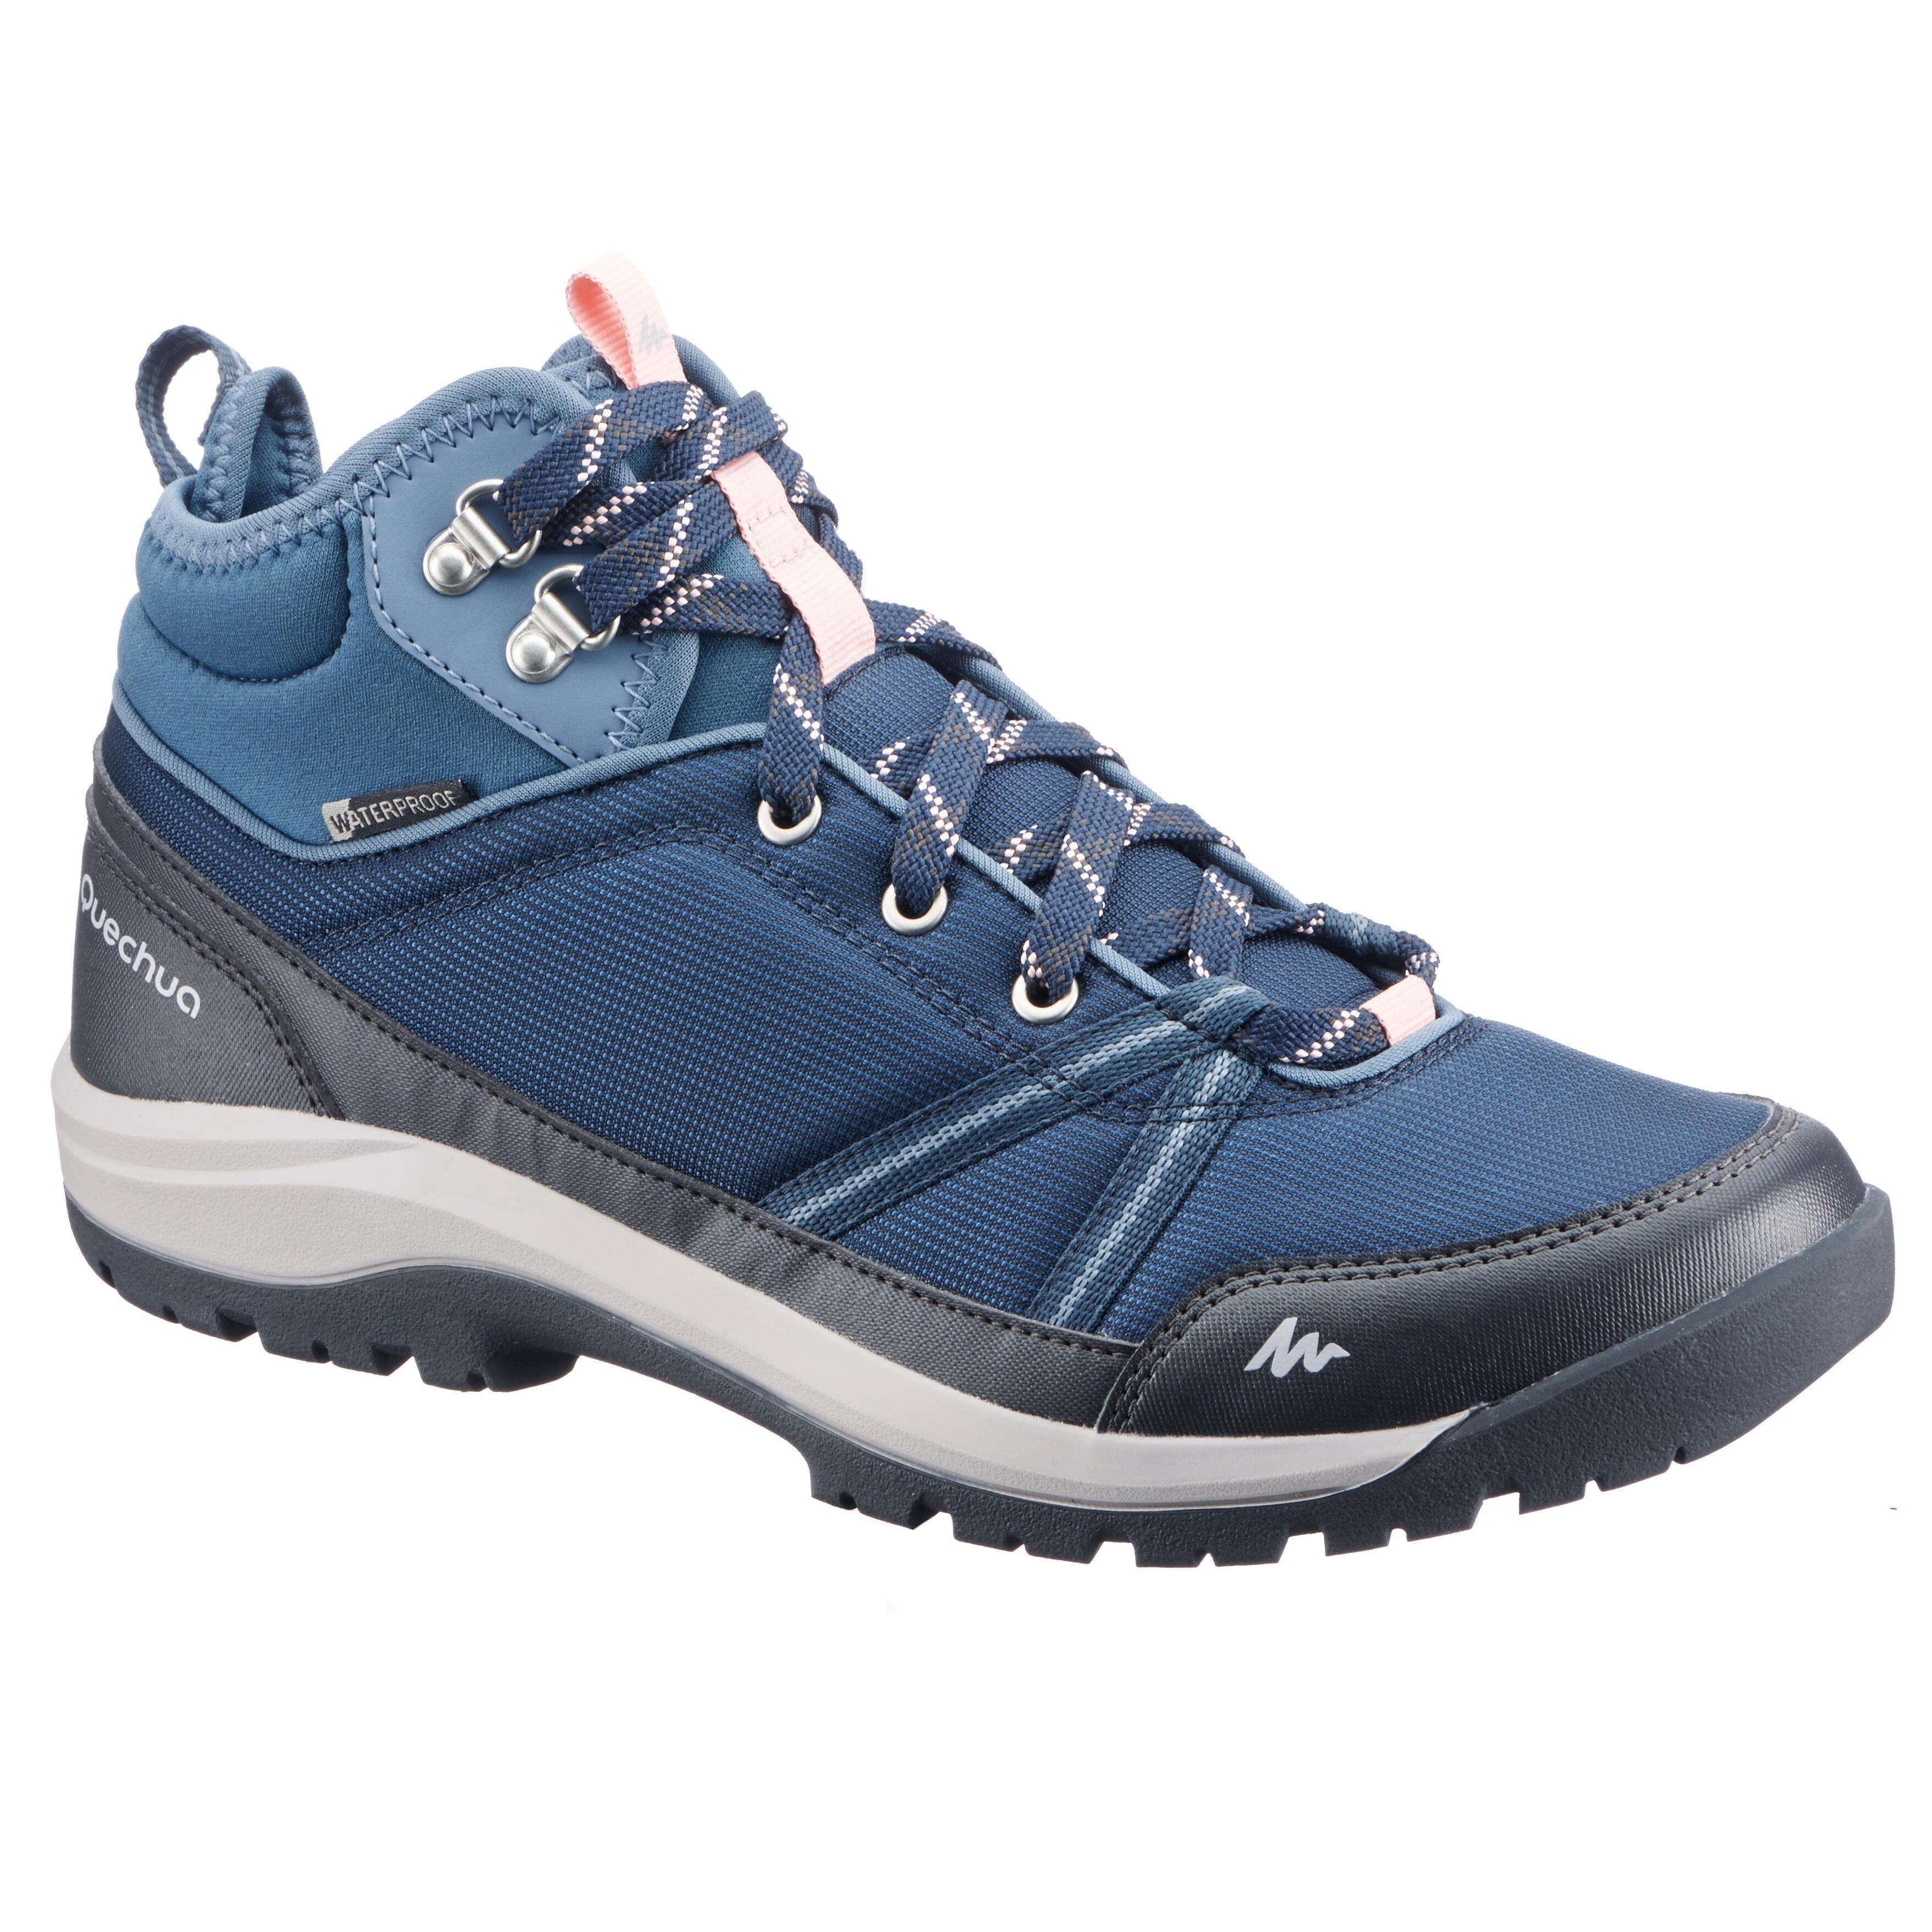 Wanderschuhe Naturwandern NH150 Mid Protect halbhoch Damen blau   Schuhe > Outdoorschuhe > Wanderschuhe   Blau - Grau   Quechua